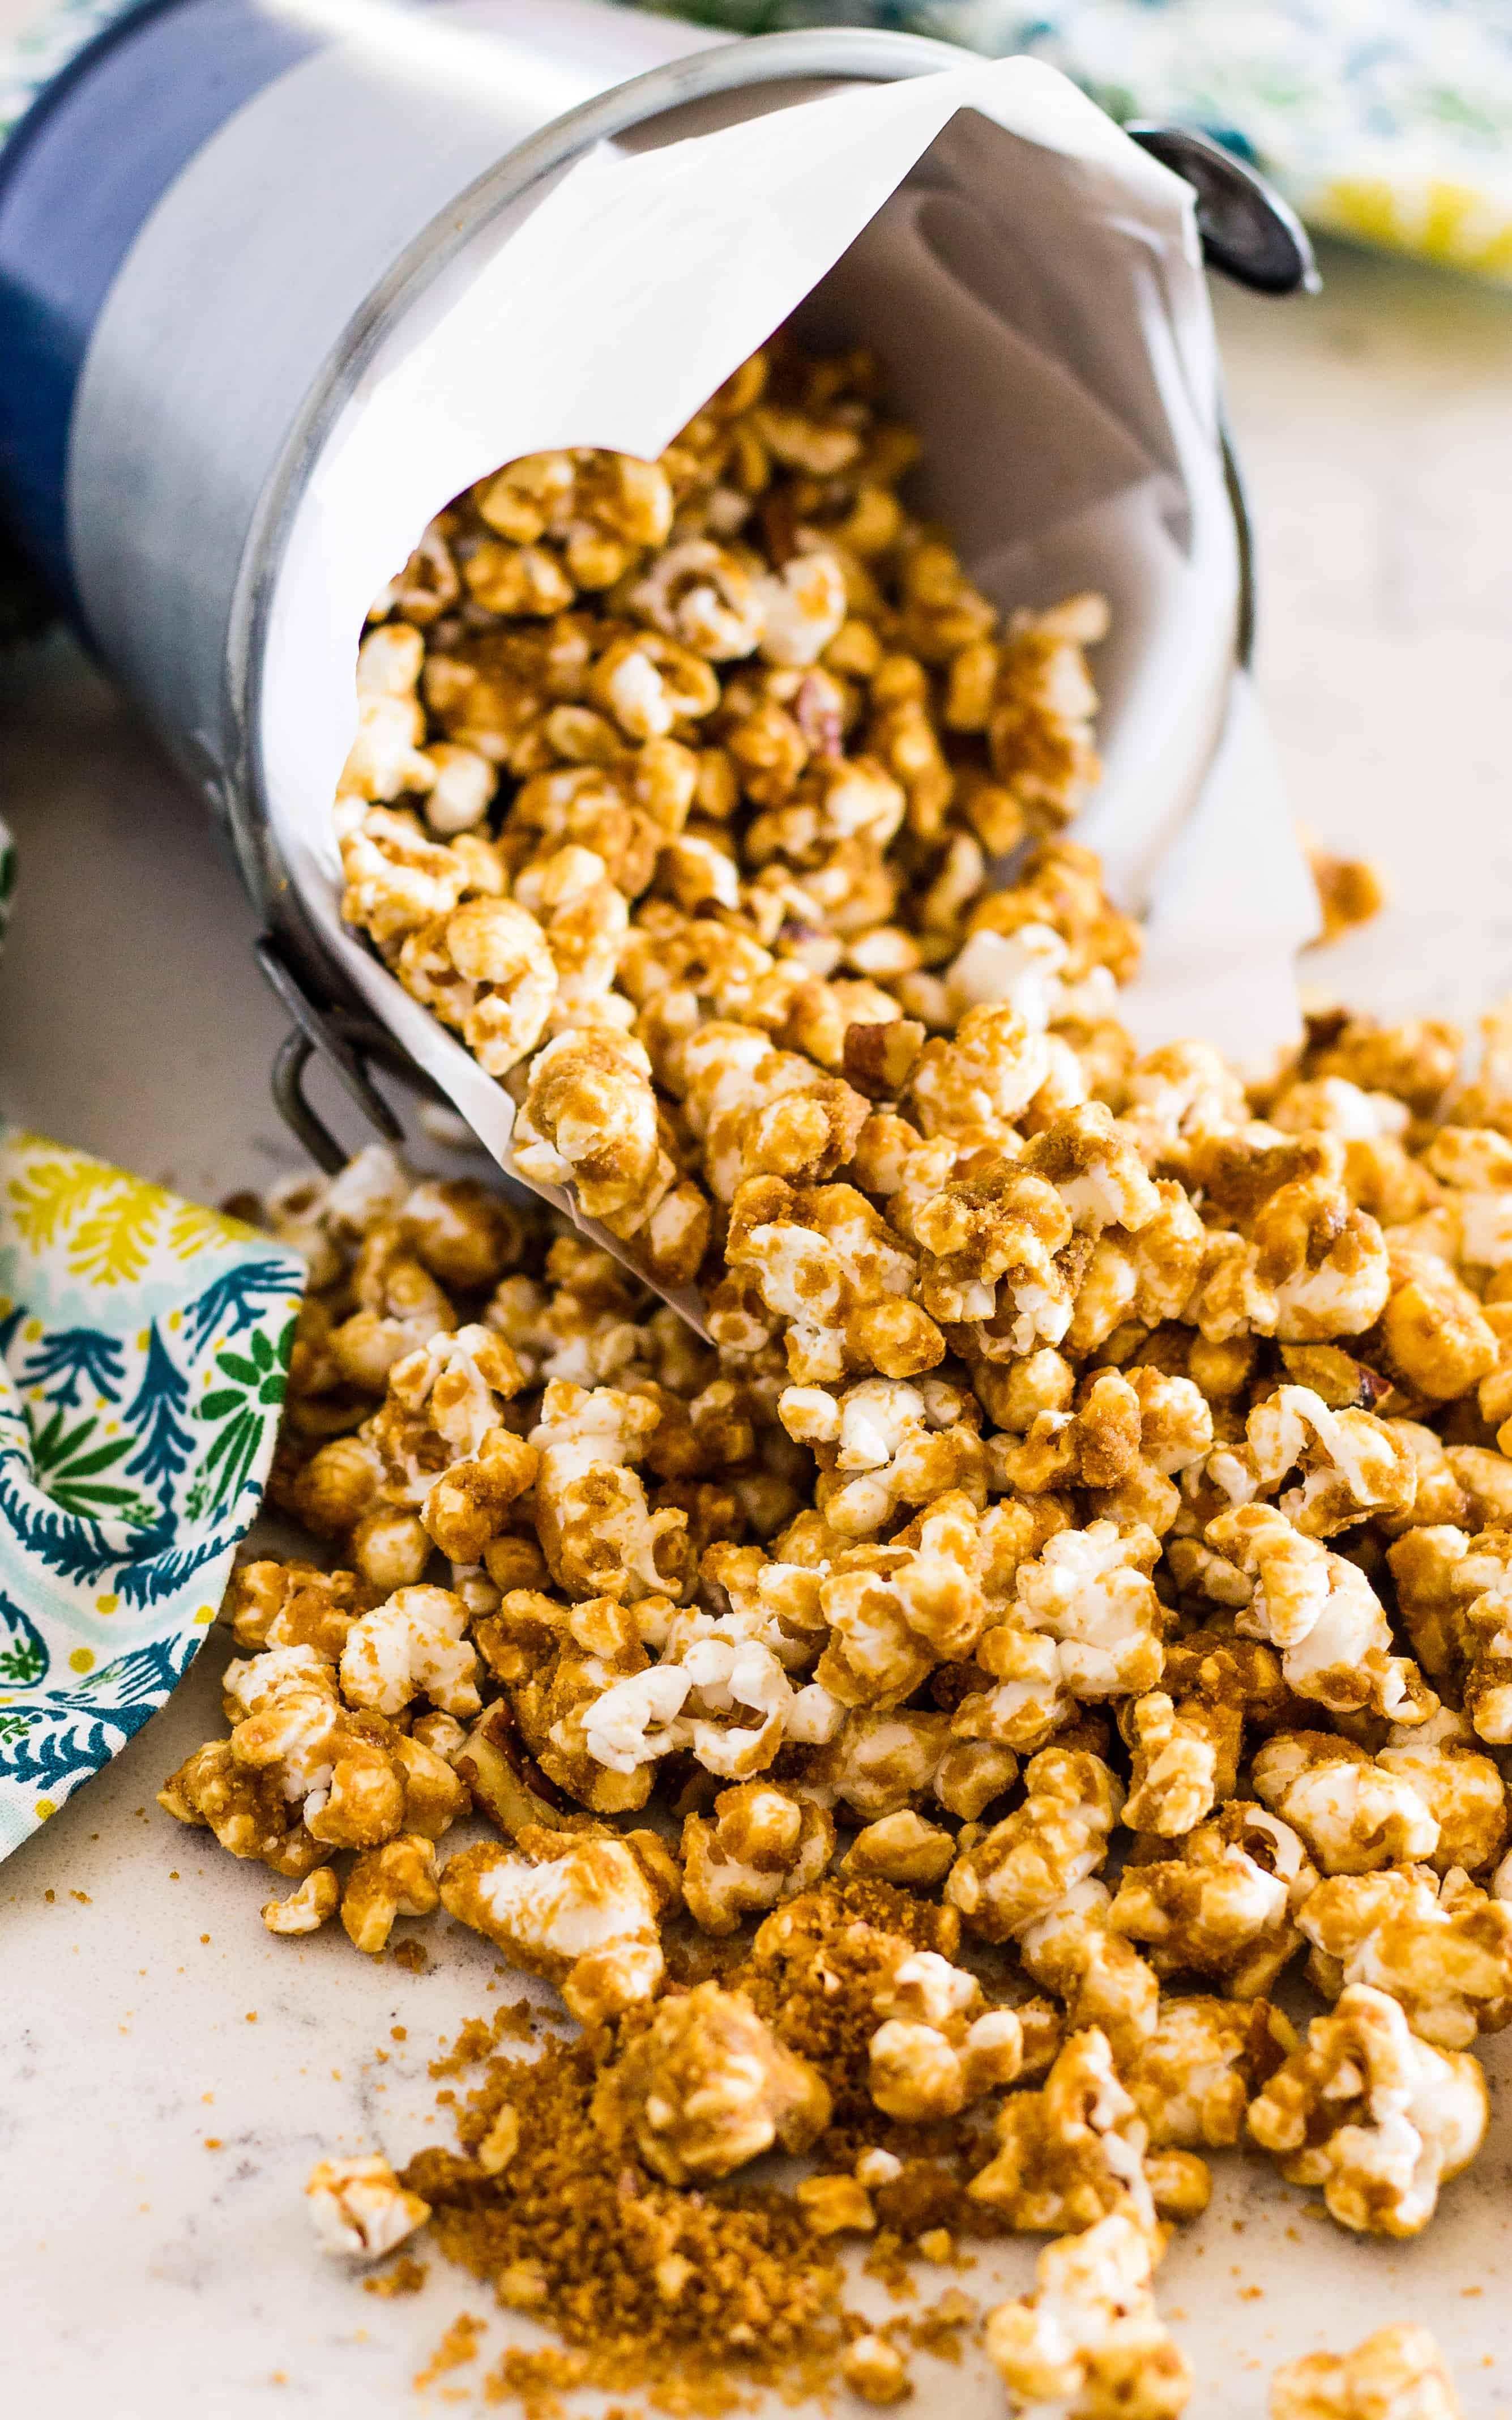 Crispy Sweet and Salty Grandma's Caramel Corn - caramel corn | Take Two Tapas | #CaramelCorn #PopcornRecipe #CaramelPopcorn #EasyCaramelCorn #SummerSnacks #SnacksToShare #GlutenFreeSnacks